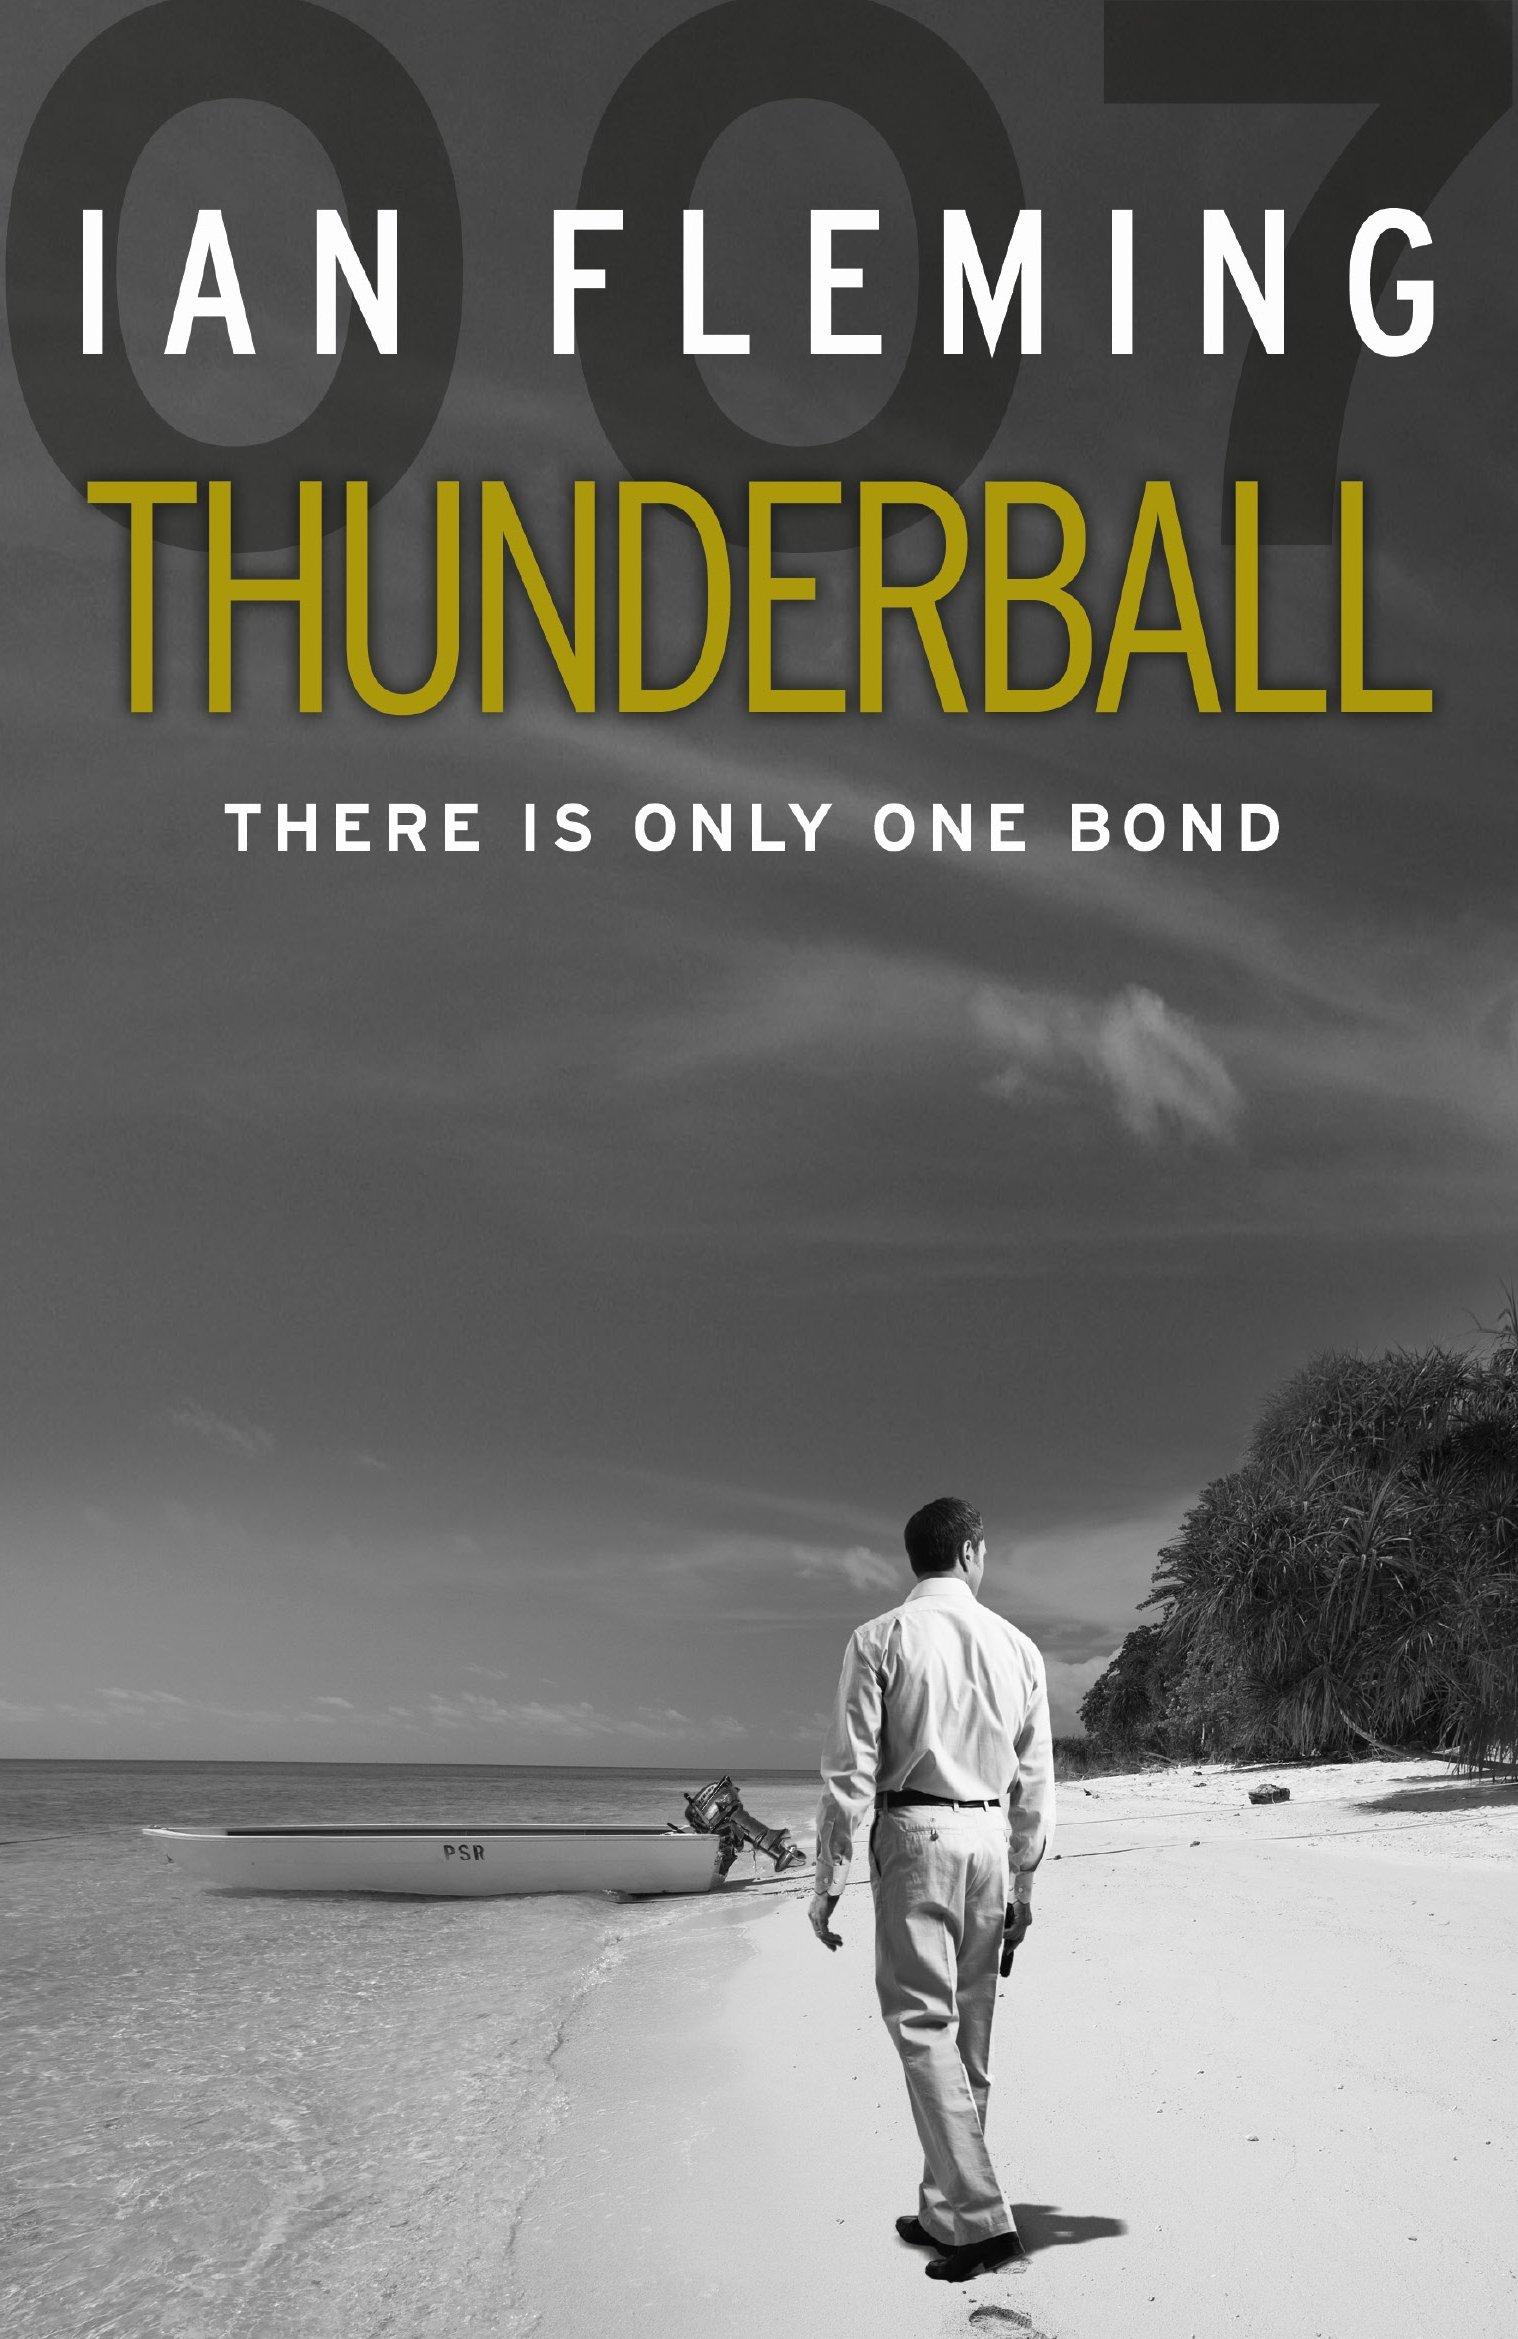 Thunderball (James Bond 007)